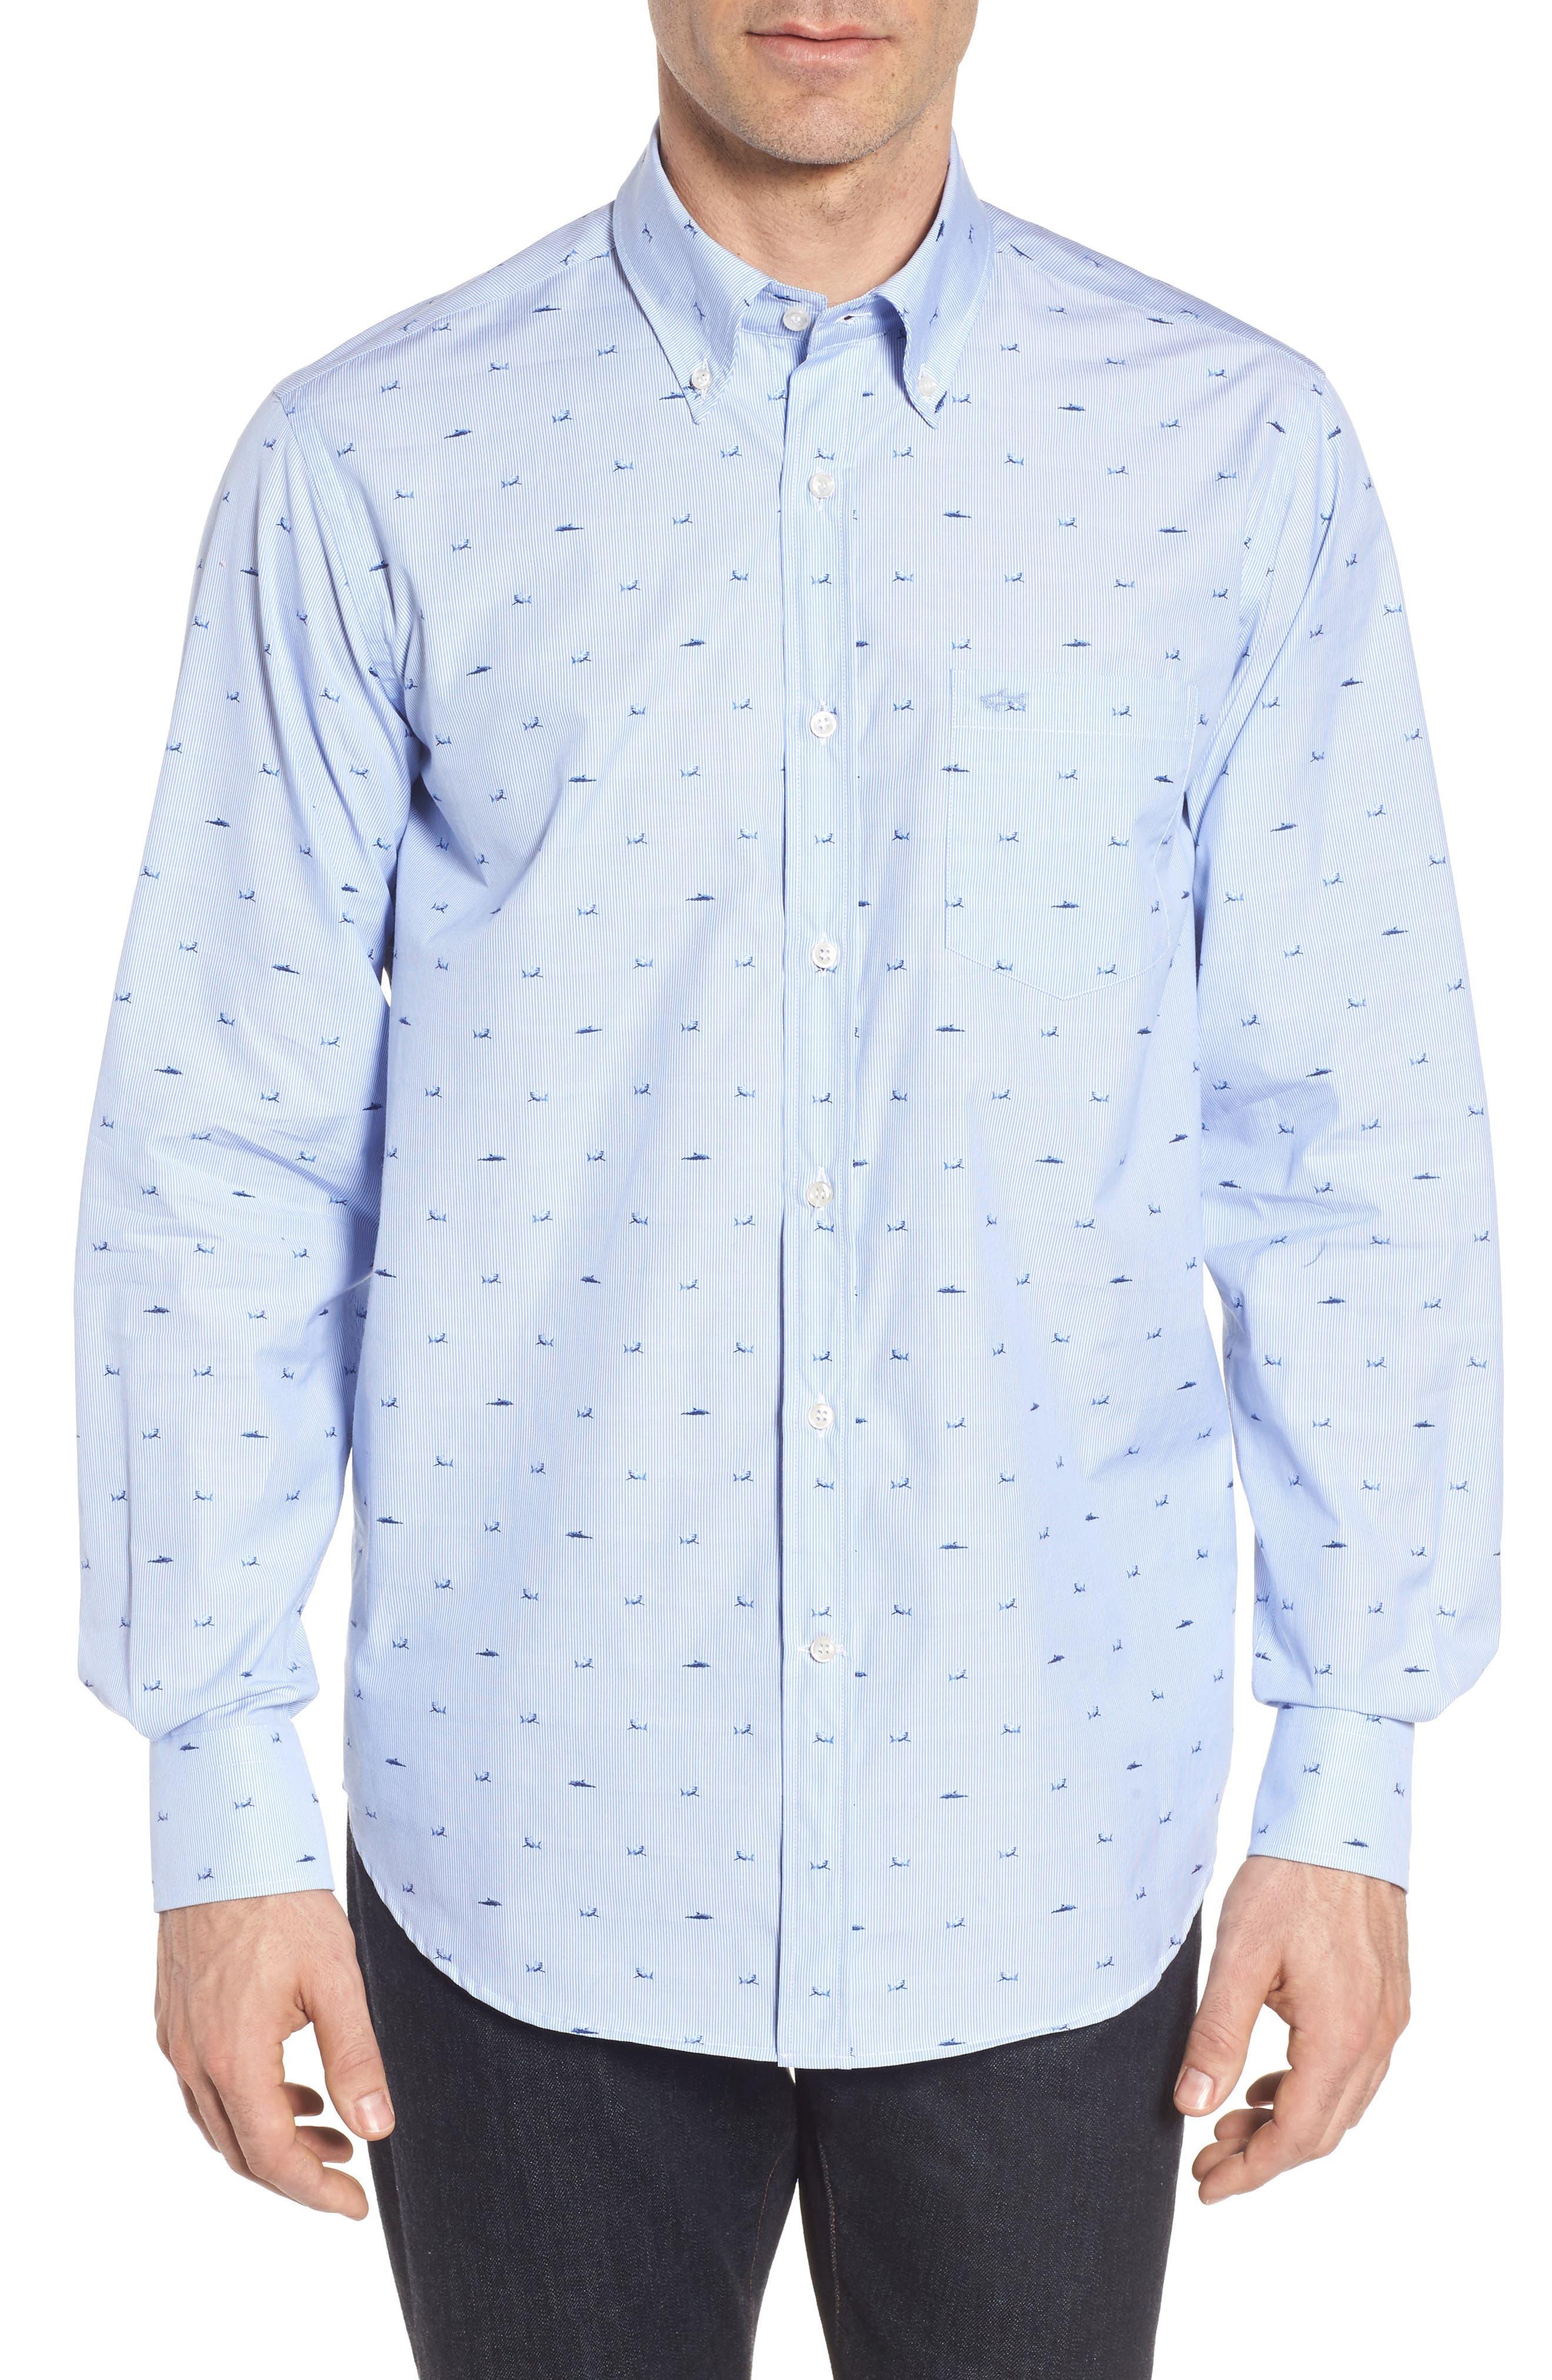 Paul&Shark Great White Jacquard Sport Shirt,                             Main thumbnail 1, color,